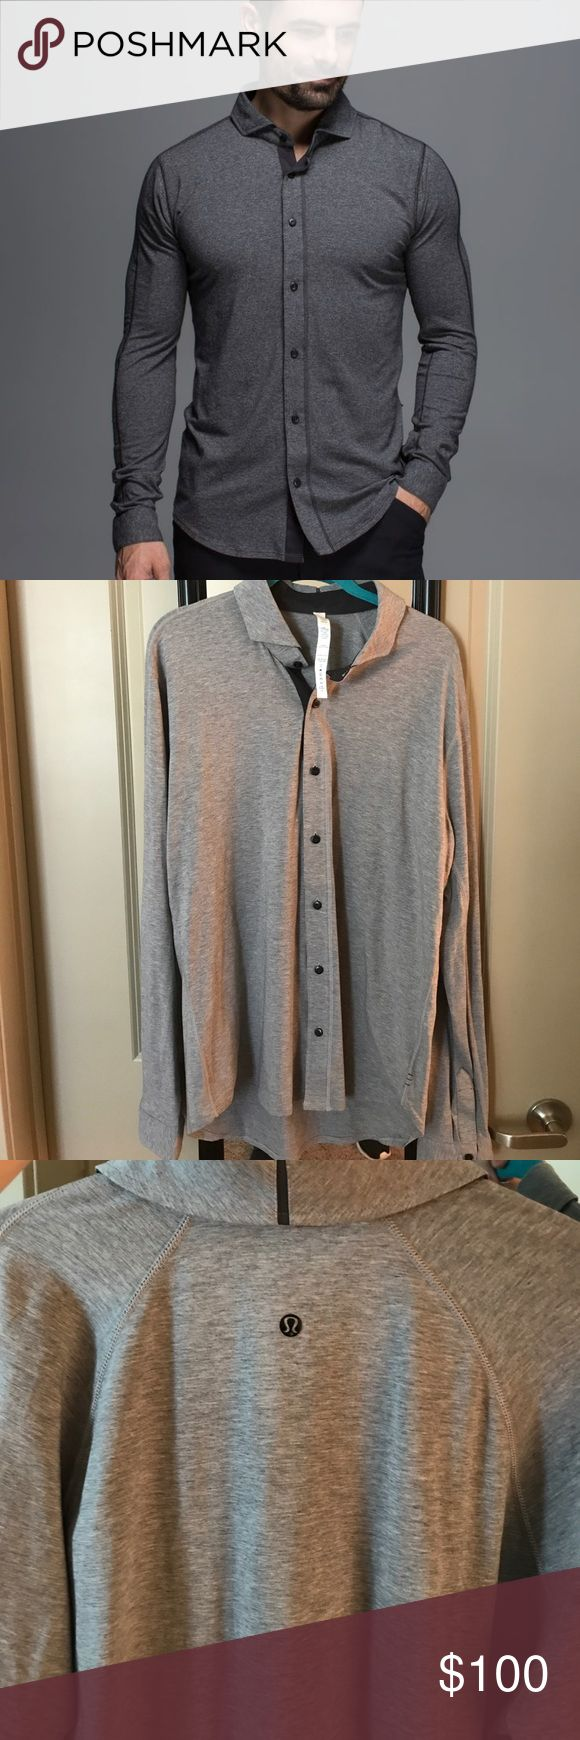 Selling this Lululemon men's dress shirt on Poshmark! My username is: lily_tiger18. #shopmycloset #poshmark #fashion #shopping #style #forsale #lululemon athletica #Other